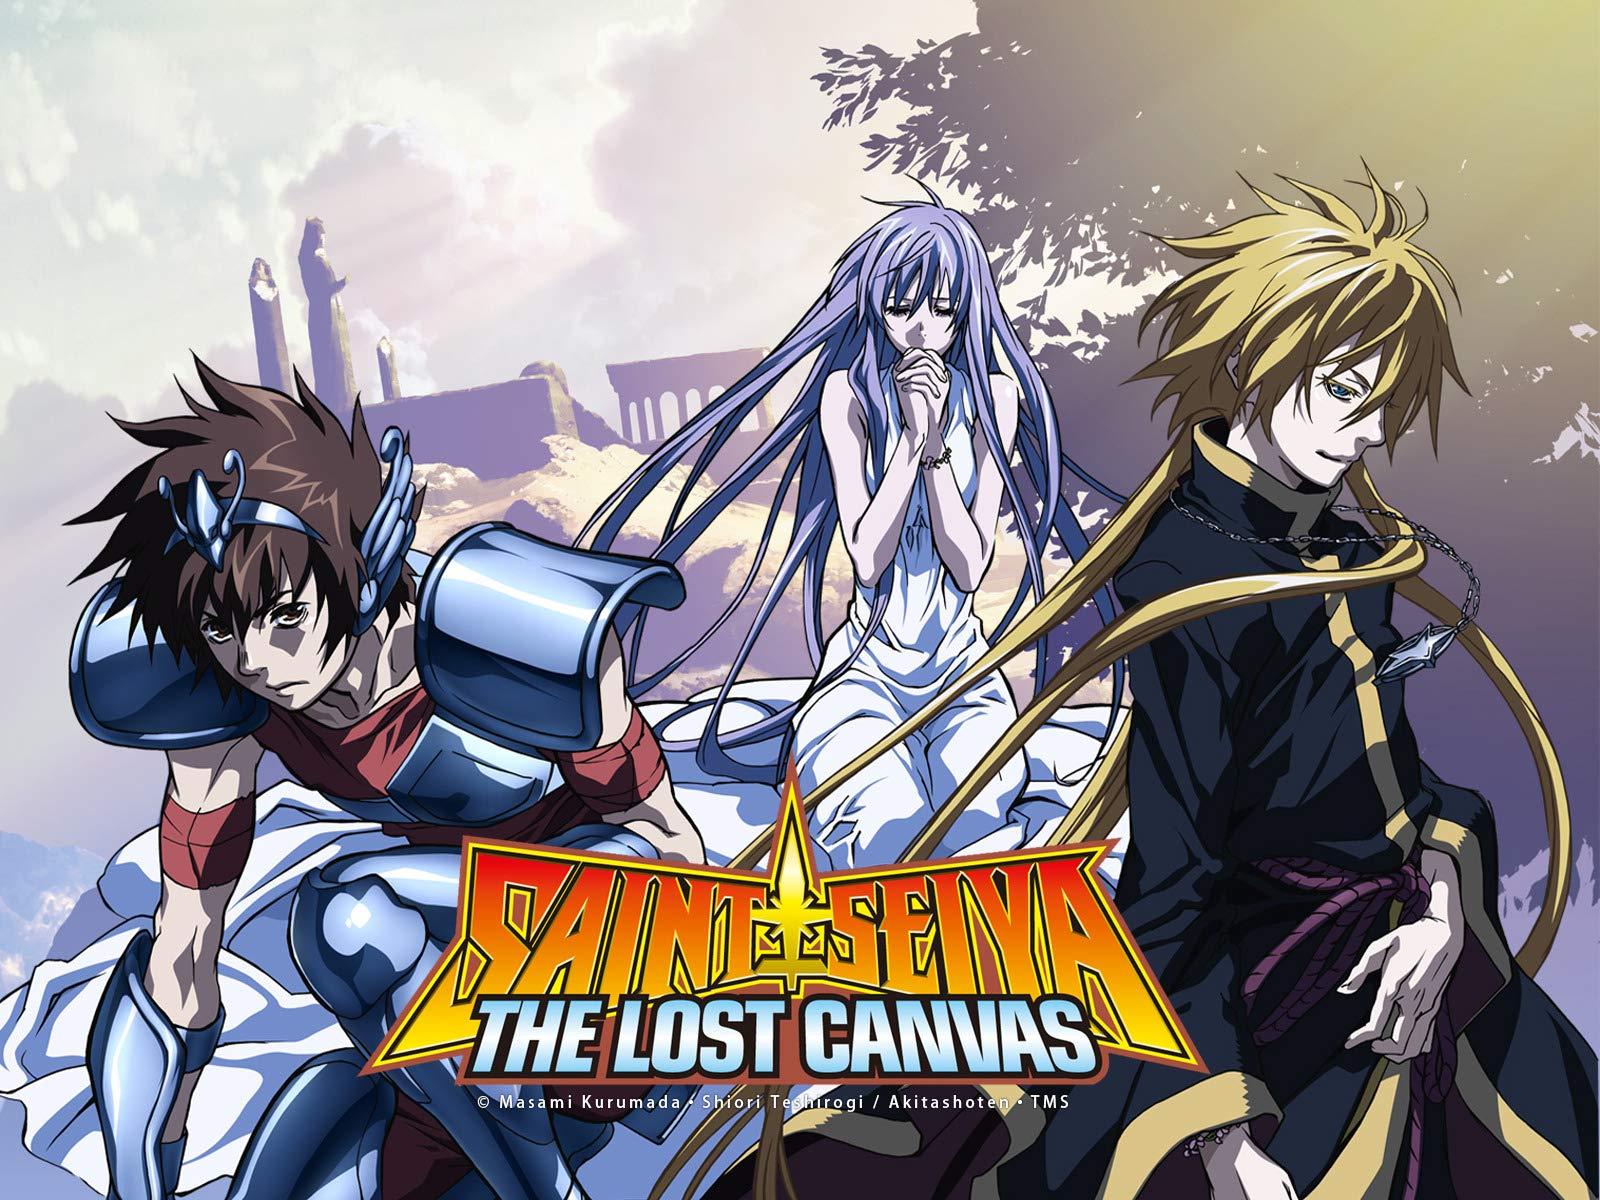 Saint Seiya: The Lost Canvas (Subtitles) on Amazon Prime Video UK